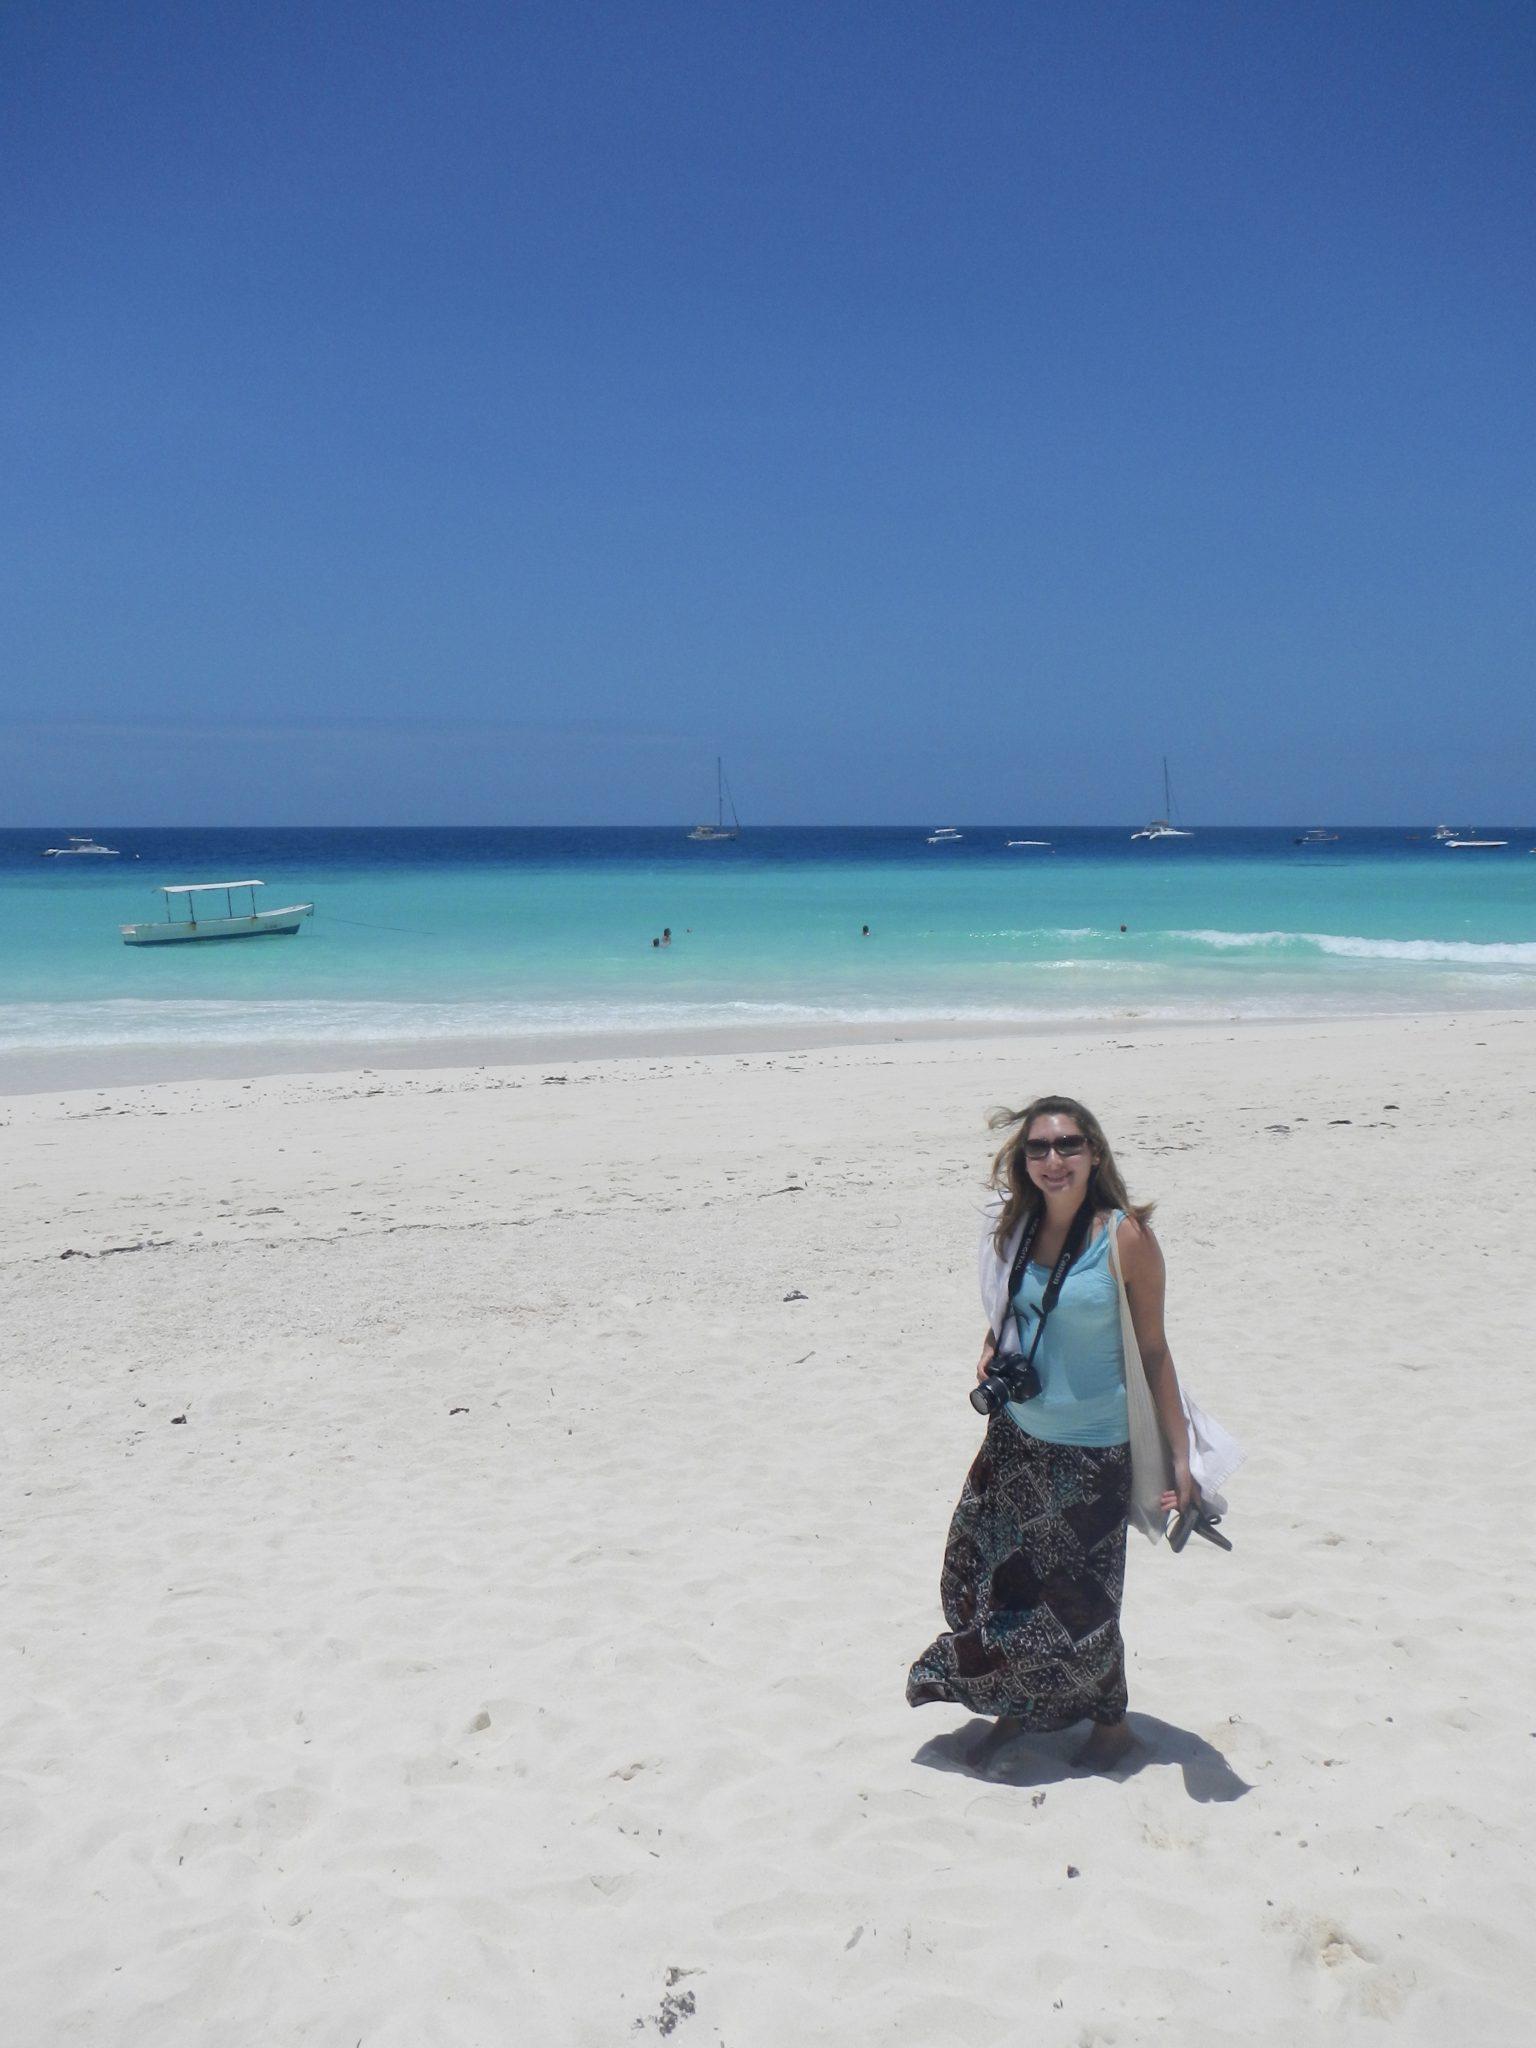 zanzibar, nungwi, tanzania, africa, beach, paradise, perfect beach